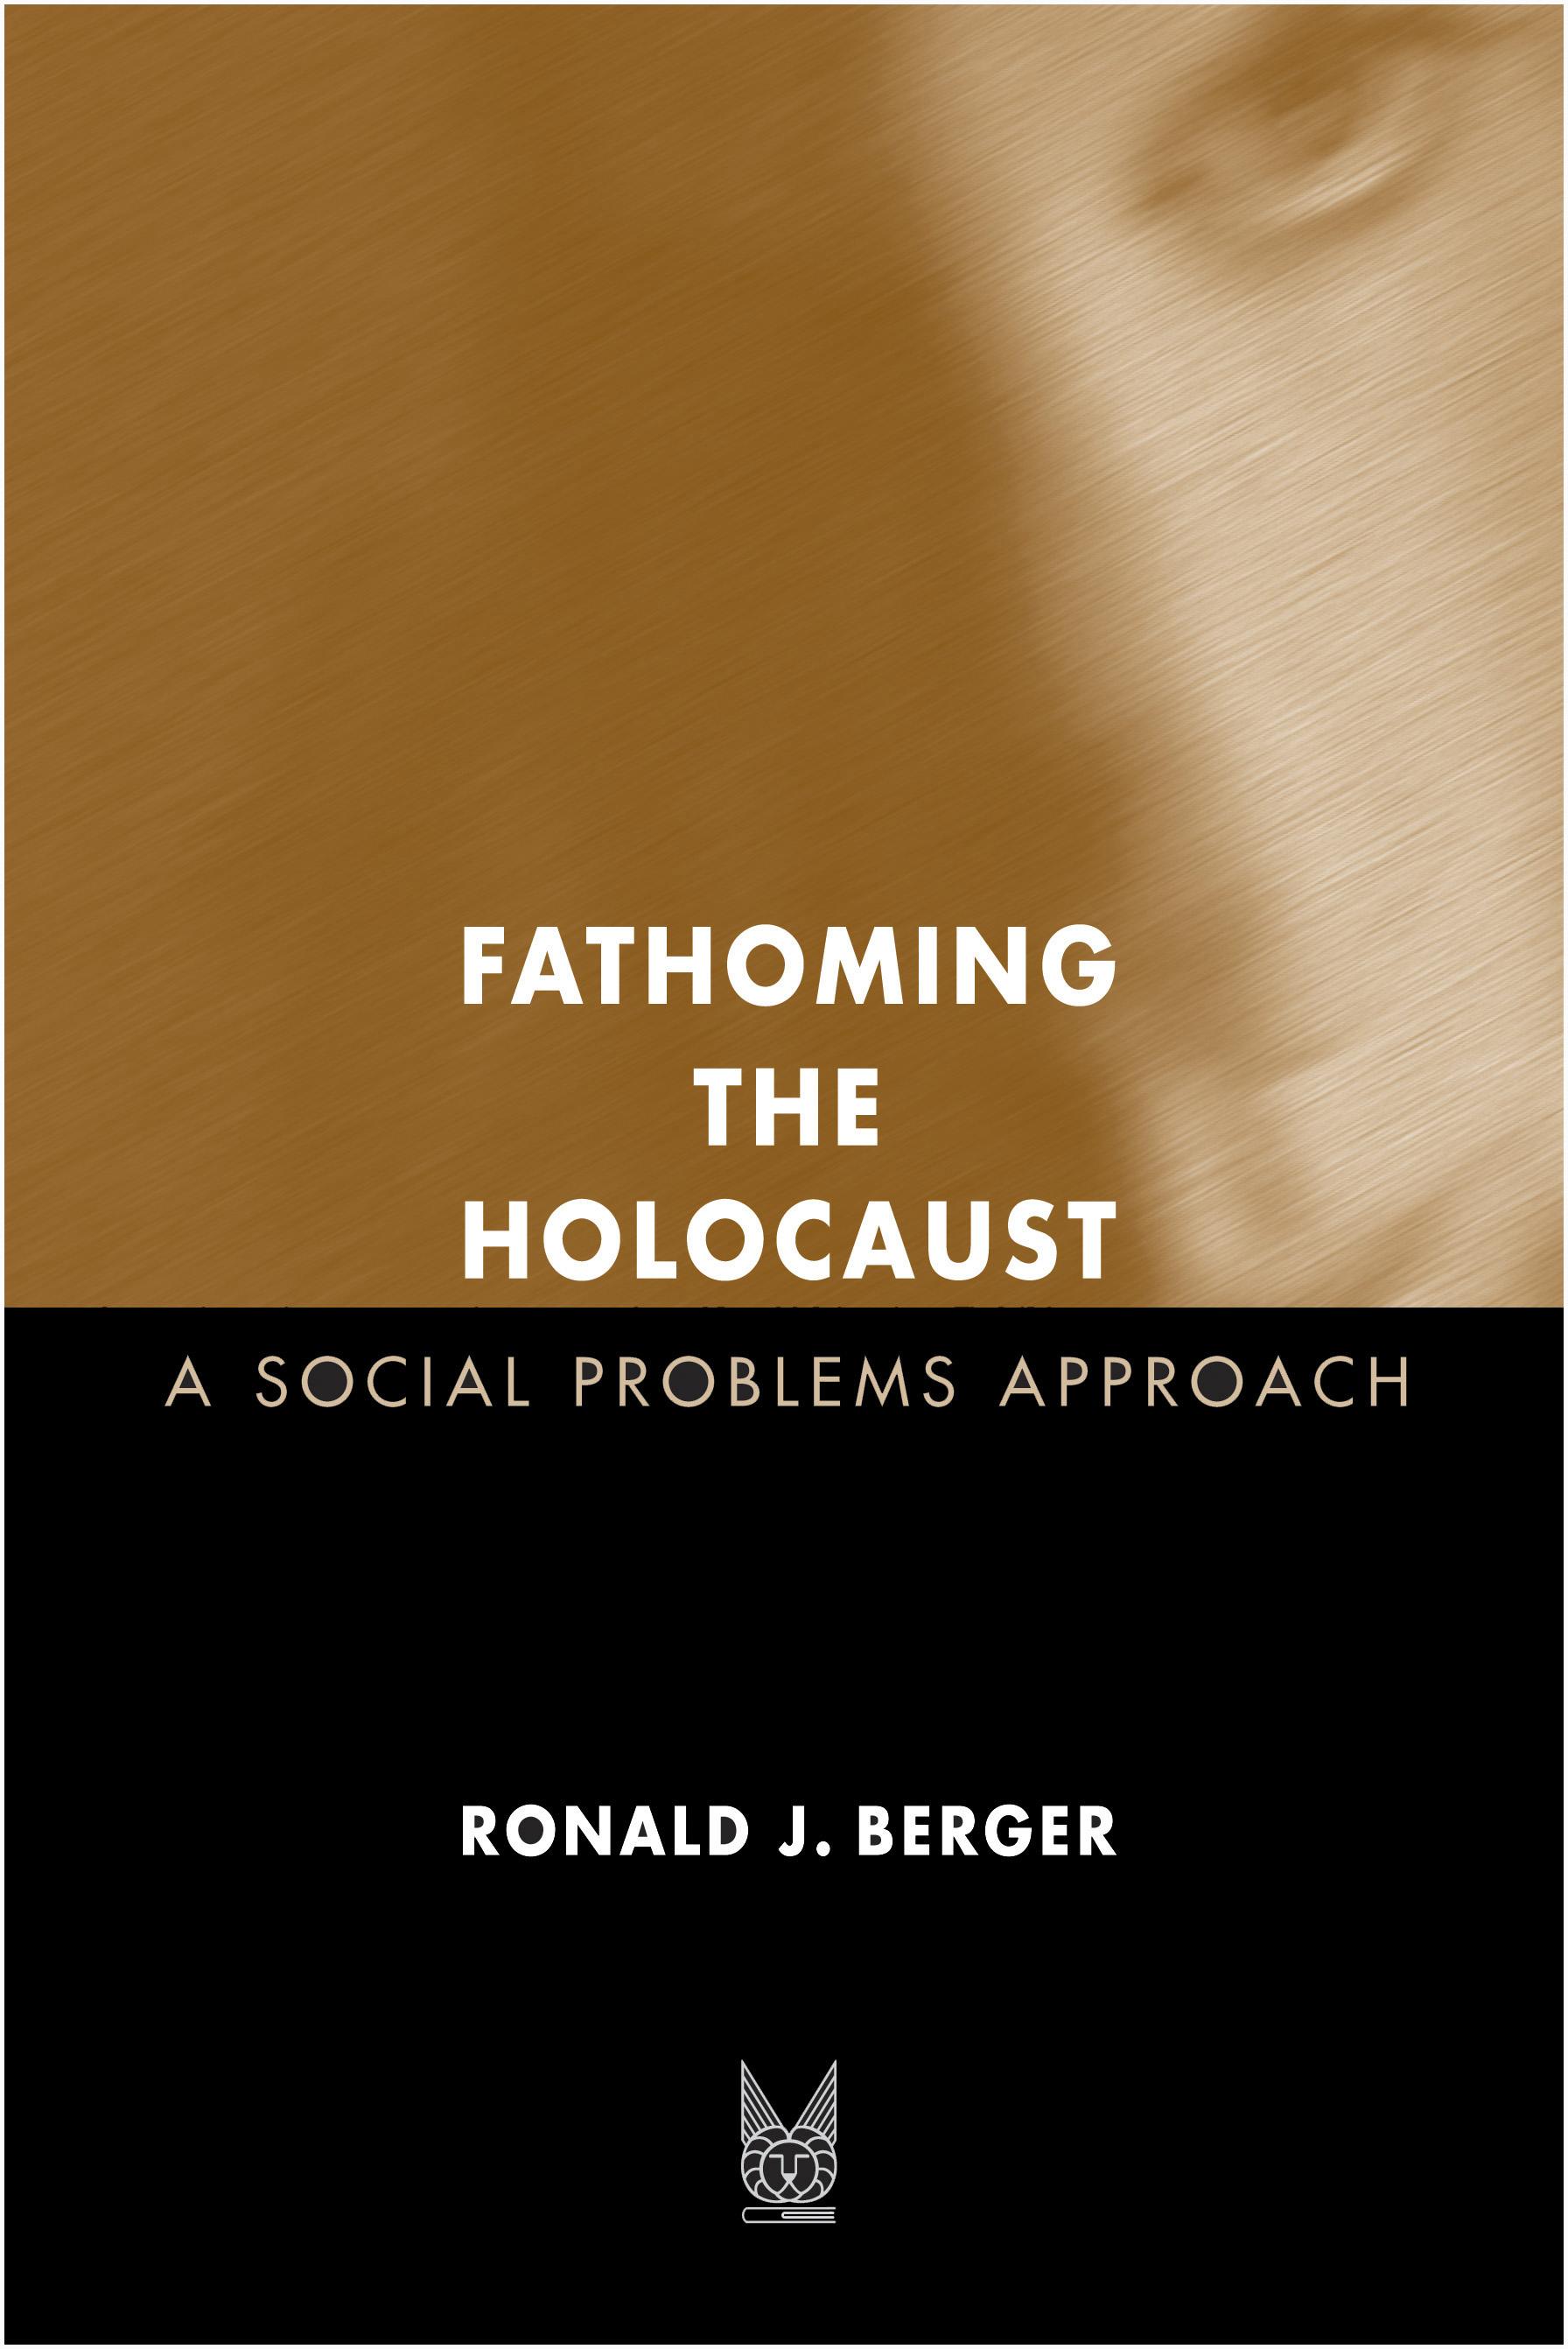 Fathoming the Holocaust